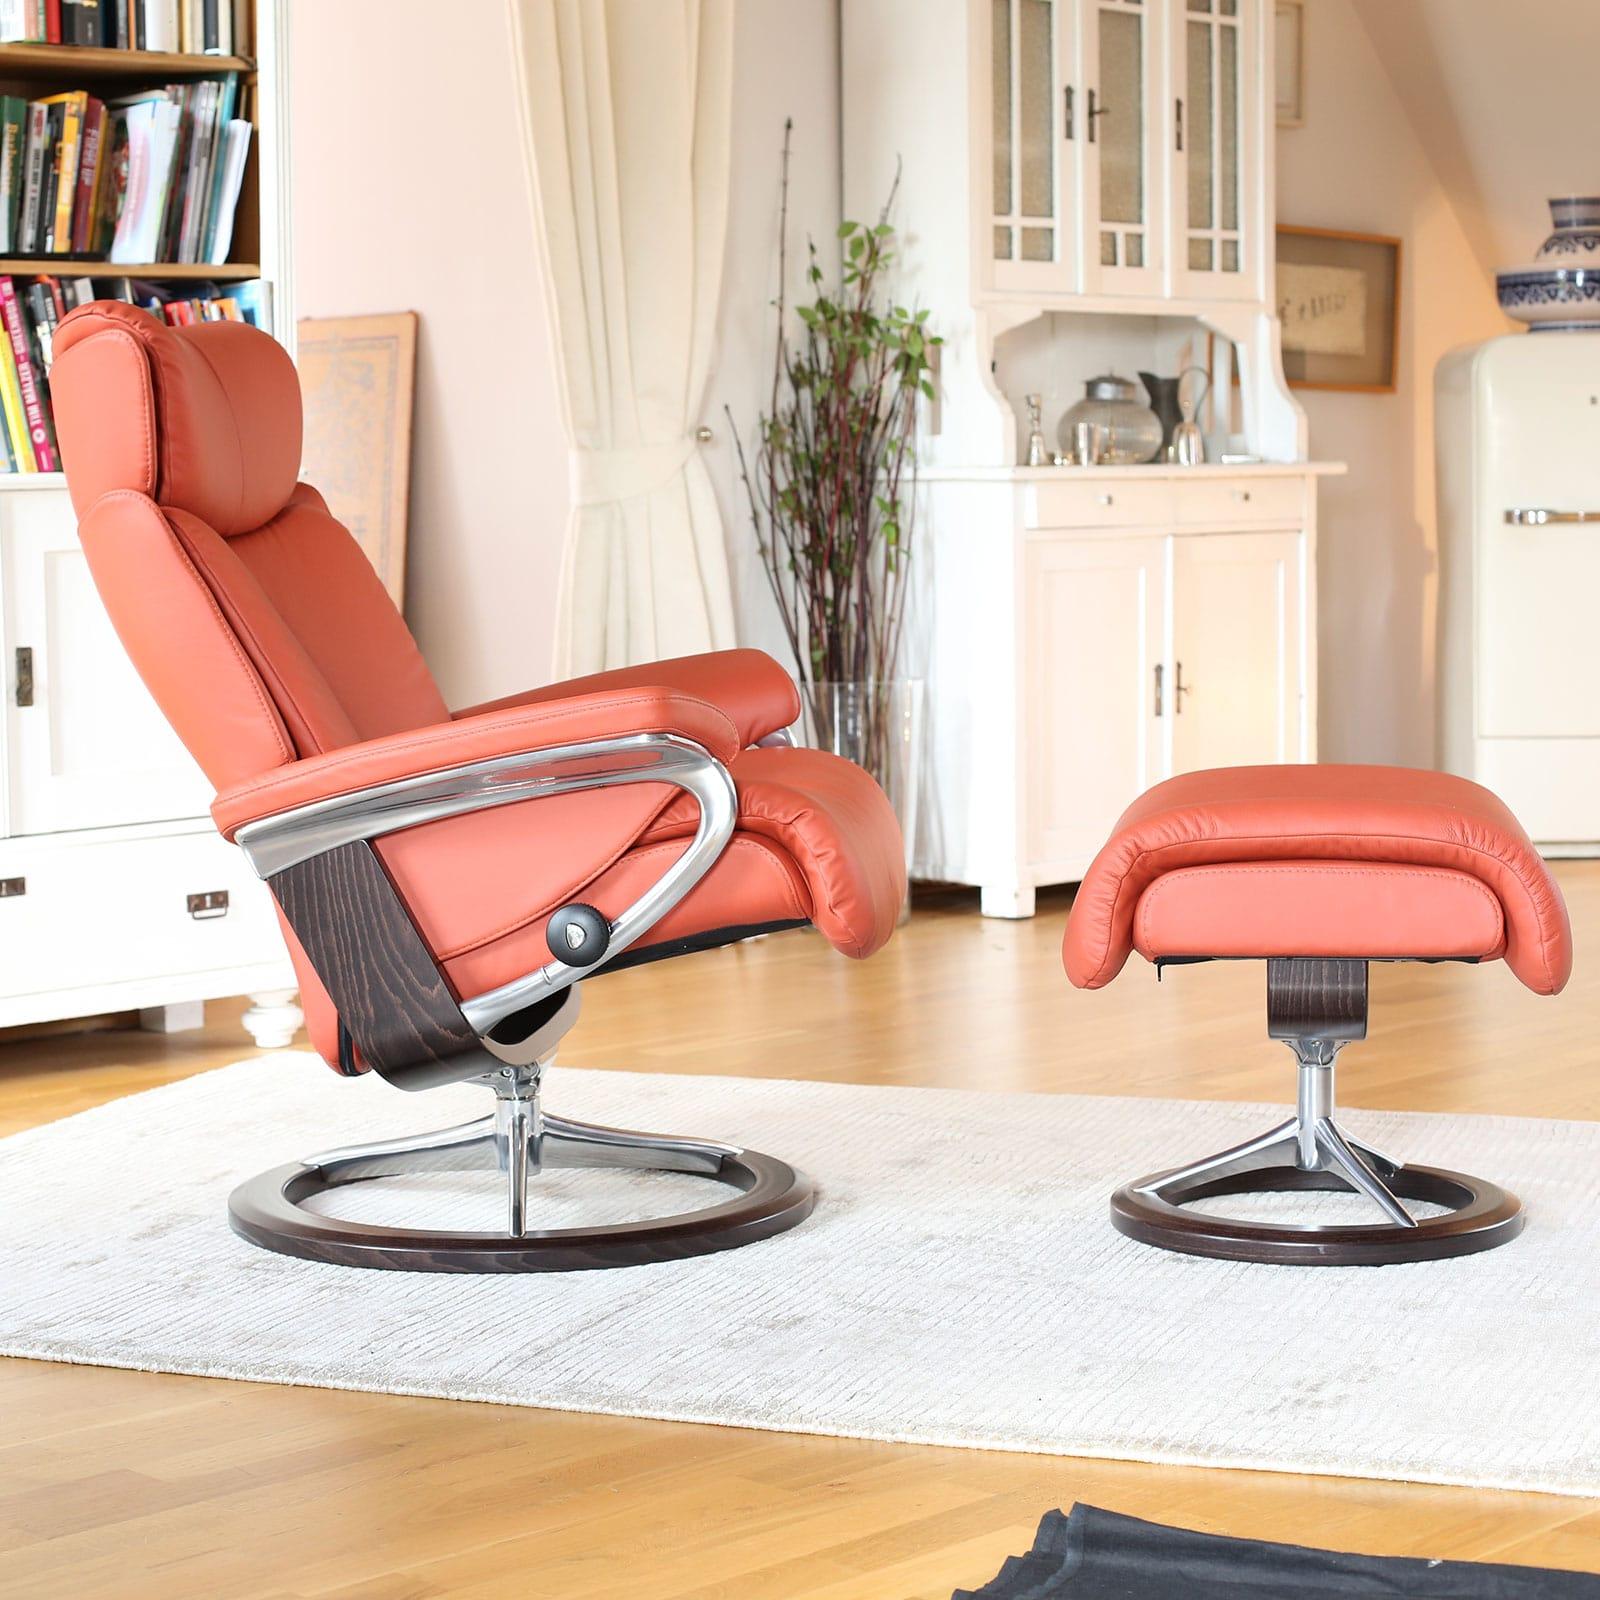 stressless skyline preis cheap cheap stressless relax. Black Bedroom Furniture Sets. Home Design Ideas